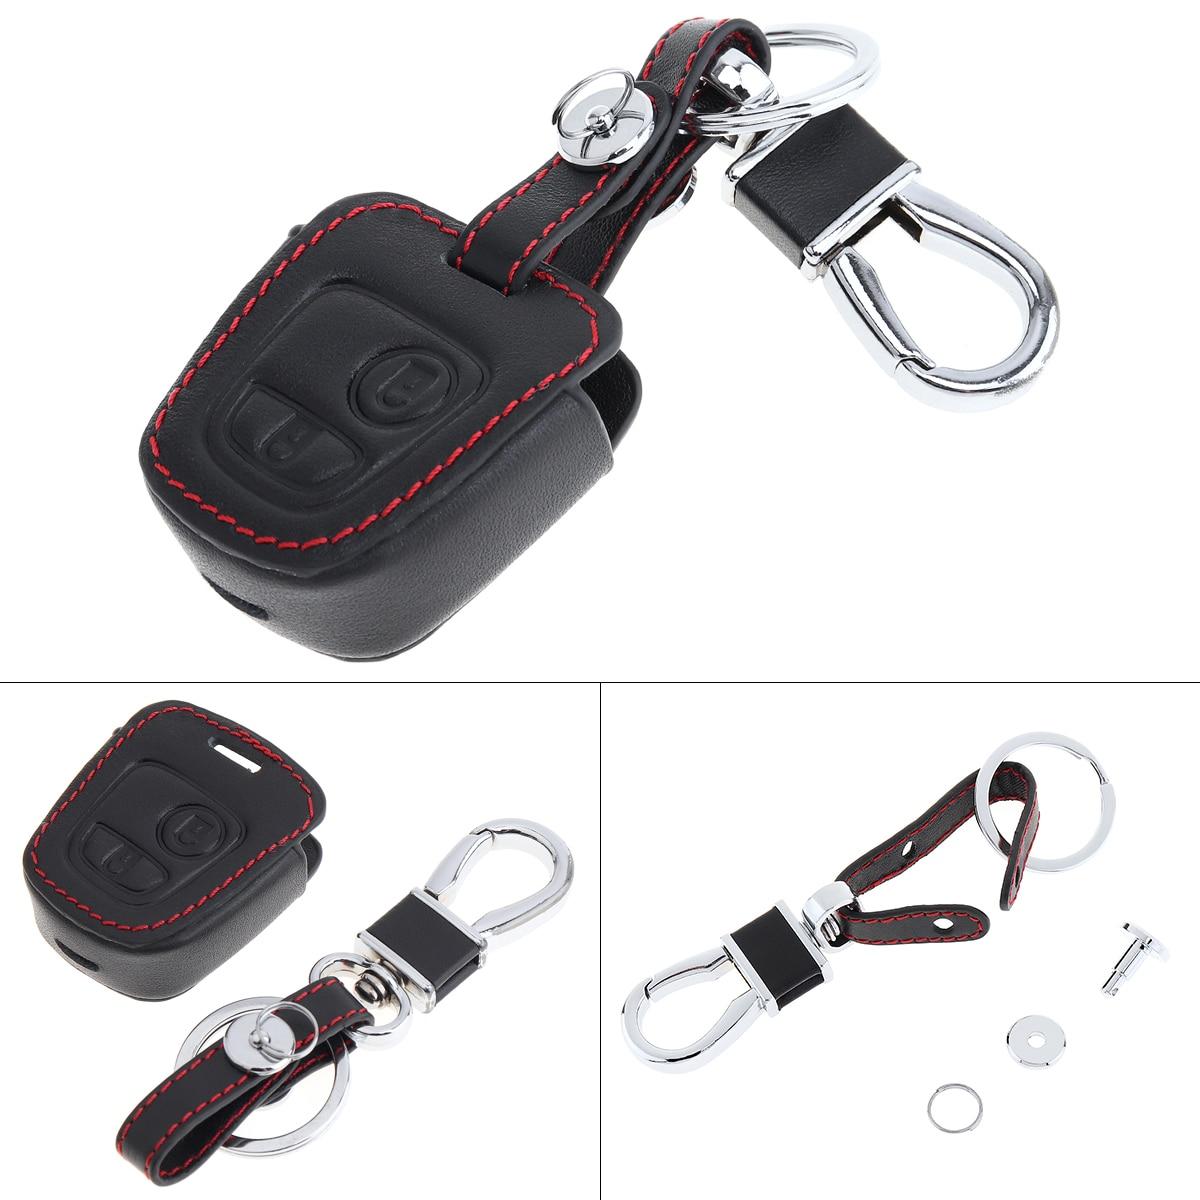 2 botones 3D de cuero de la cubierta de la llave del coche titular del Protector para Peugeot 206 207 307/Elysee/Citroen C1 C2 C3 C4 Xsara Picasso 2000-2009